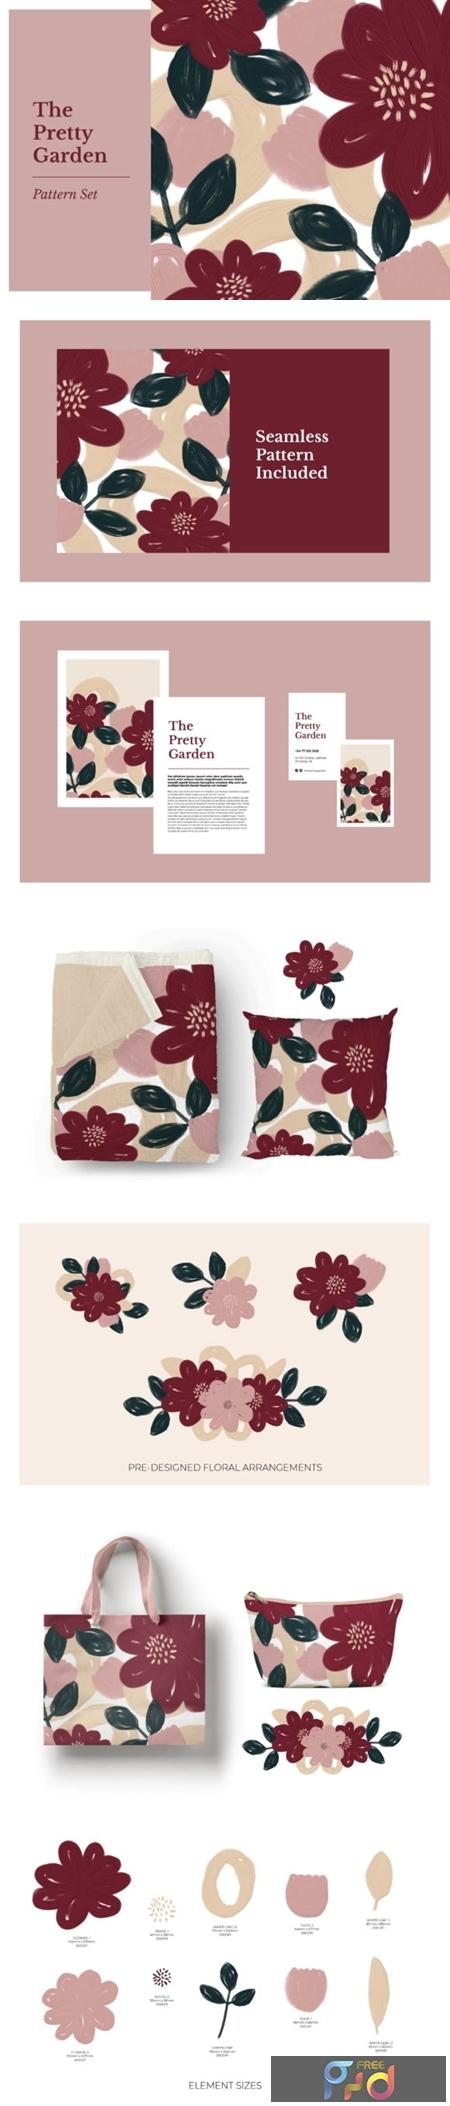 The Pretty Garden Seamless Pattern Set 1505878 1